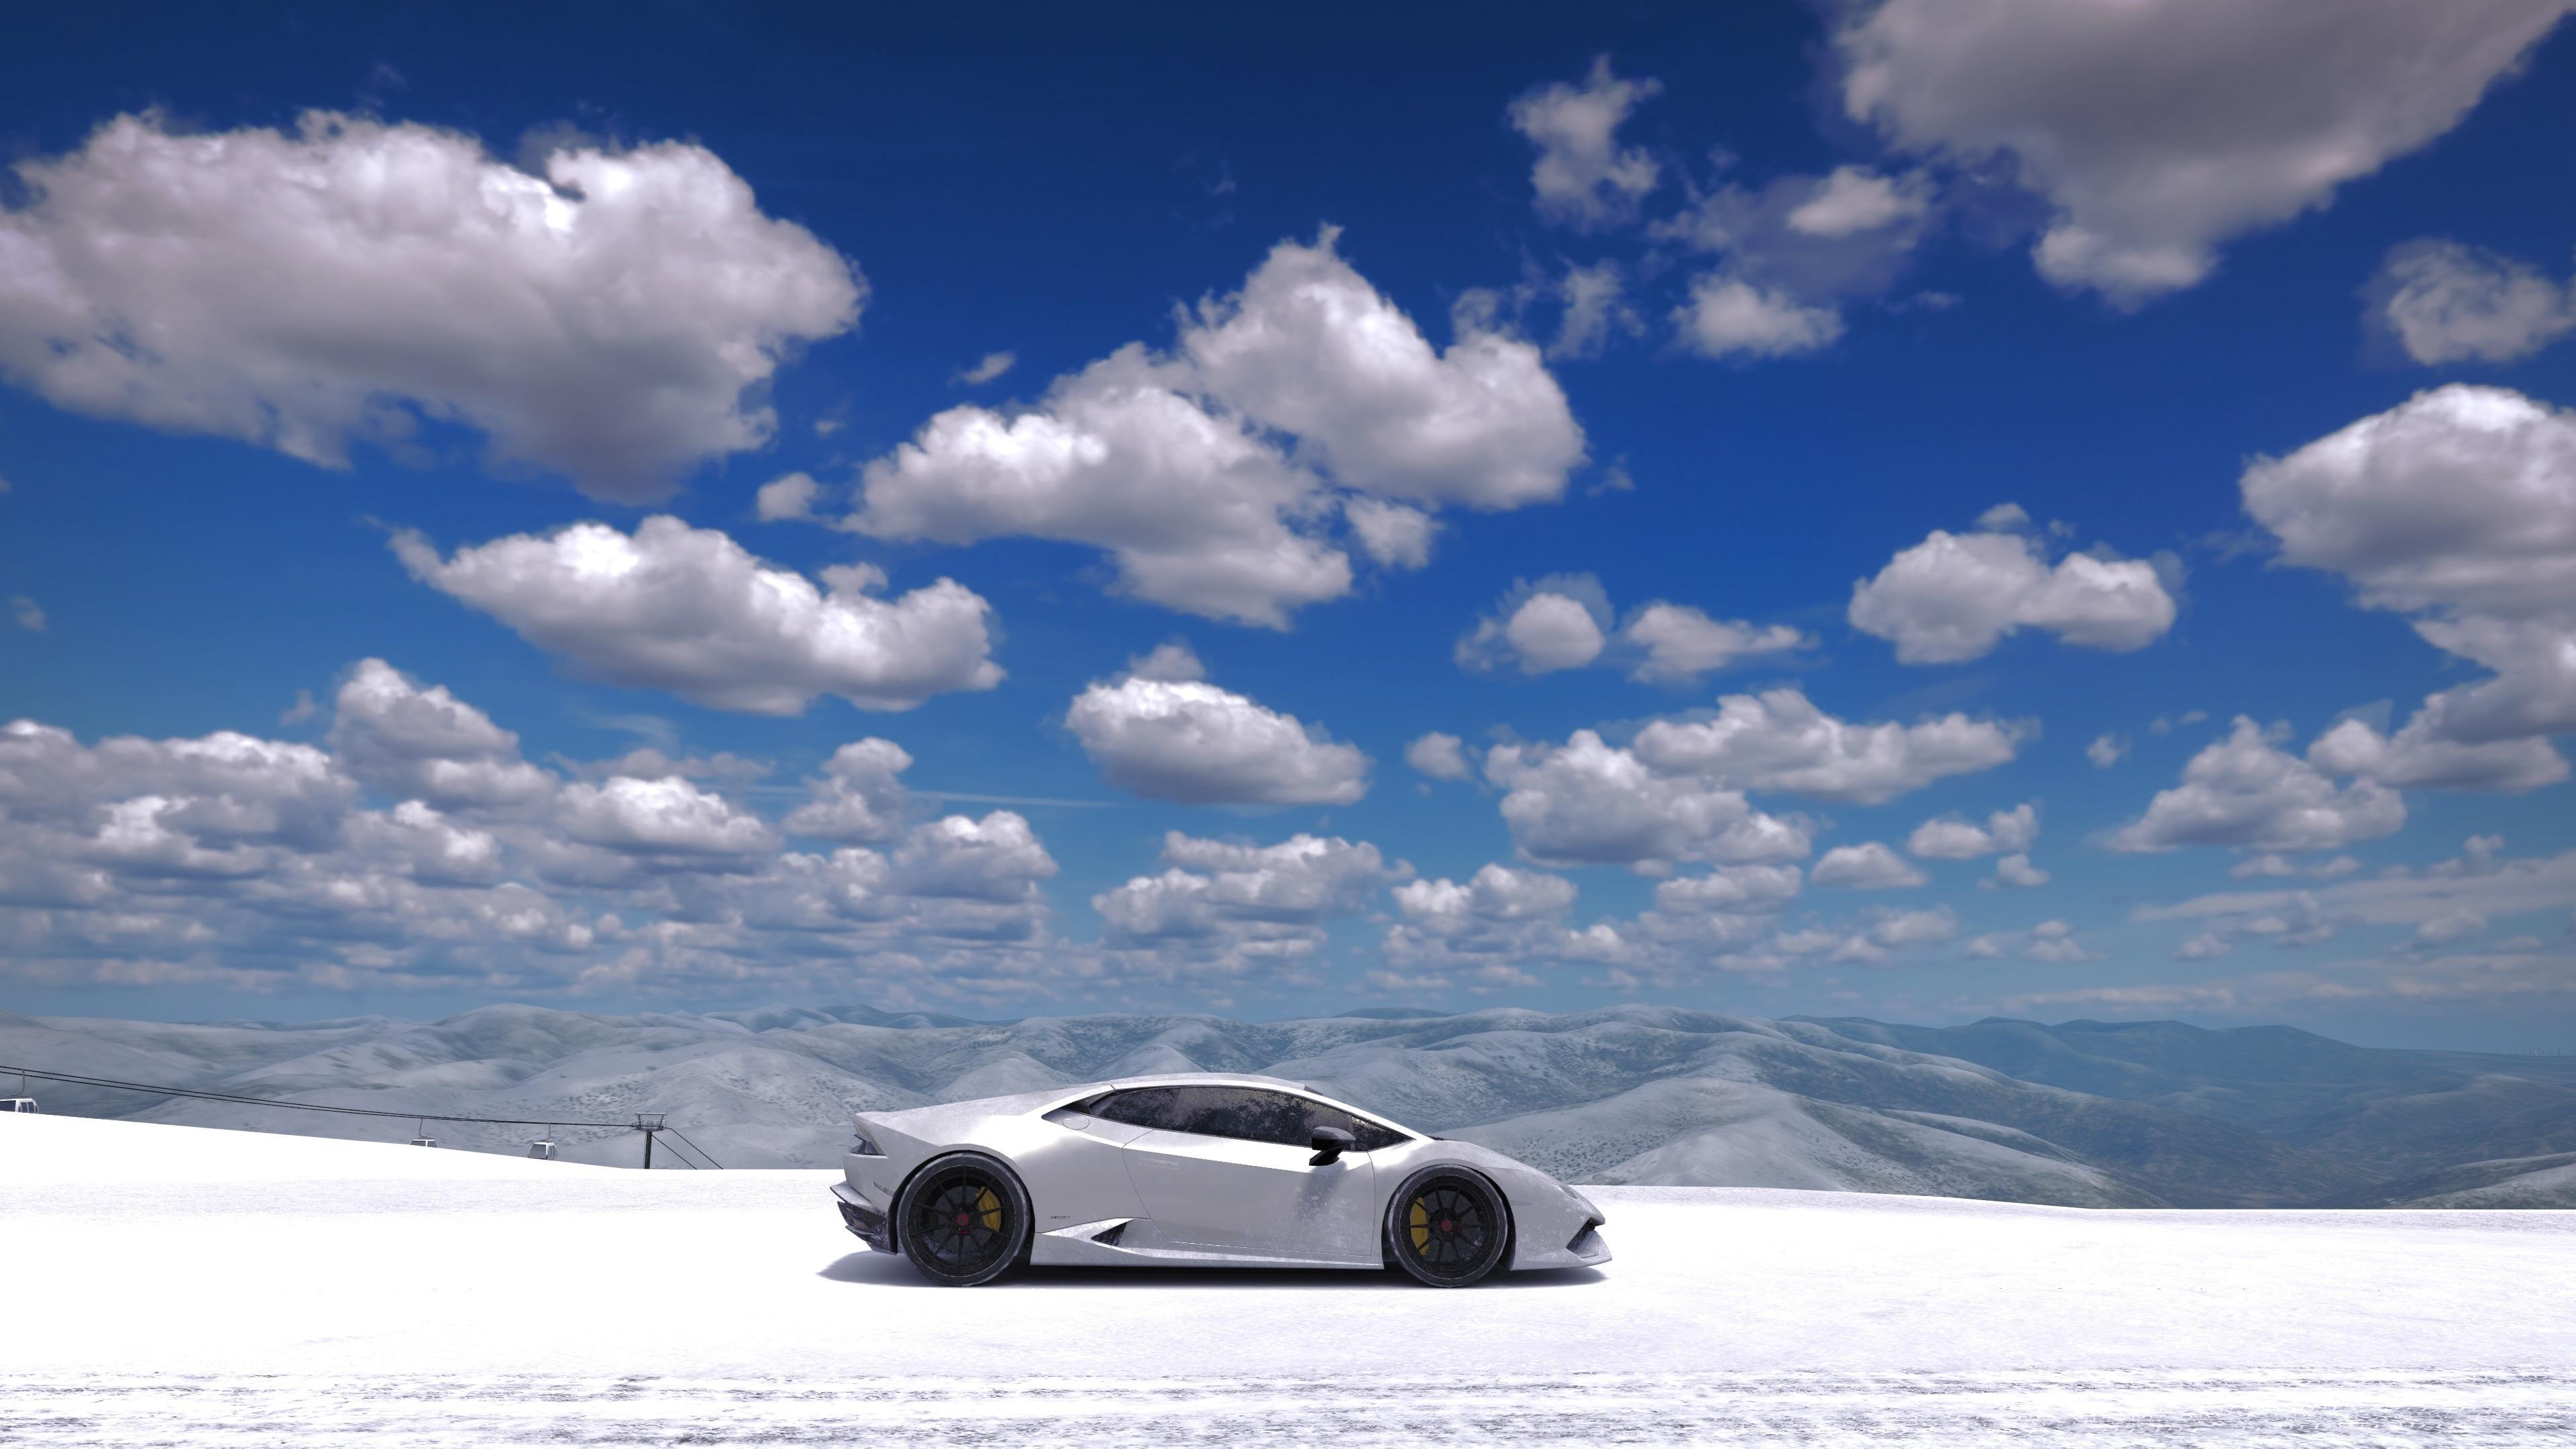 Forza Motorsport 7 Video Game Sports Car Landscape 3840x2400 Wallpaper